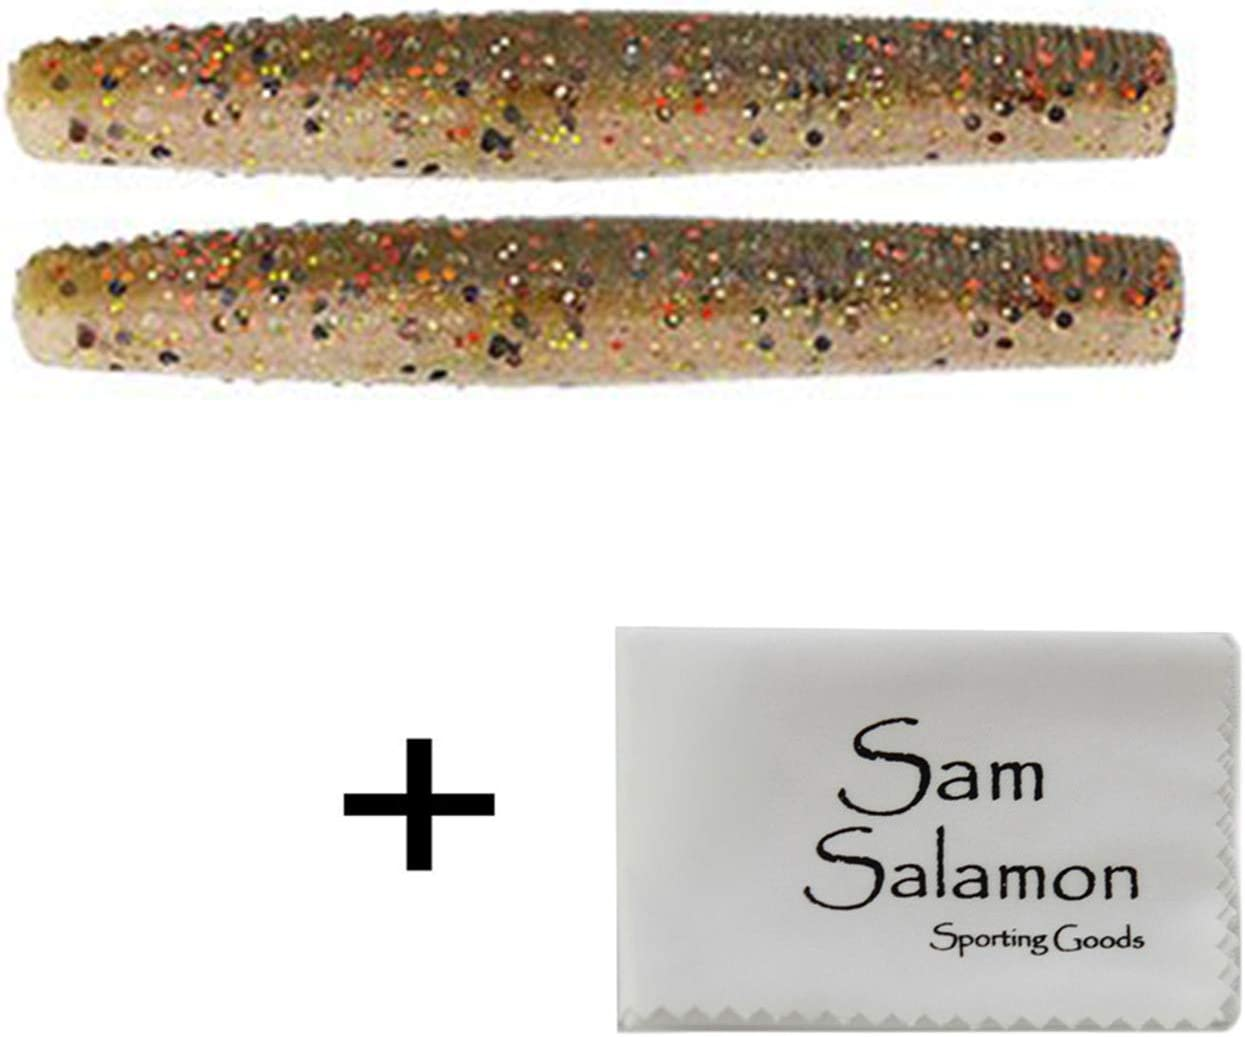 Z-MAN Finesse TRD Tackle w//Micro Sam Salamon Cloth 2 Pack of 8 pcs